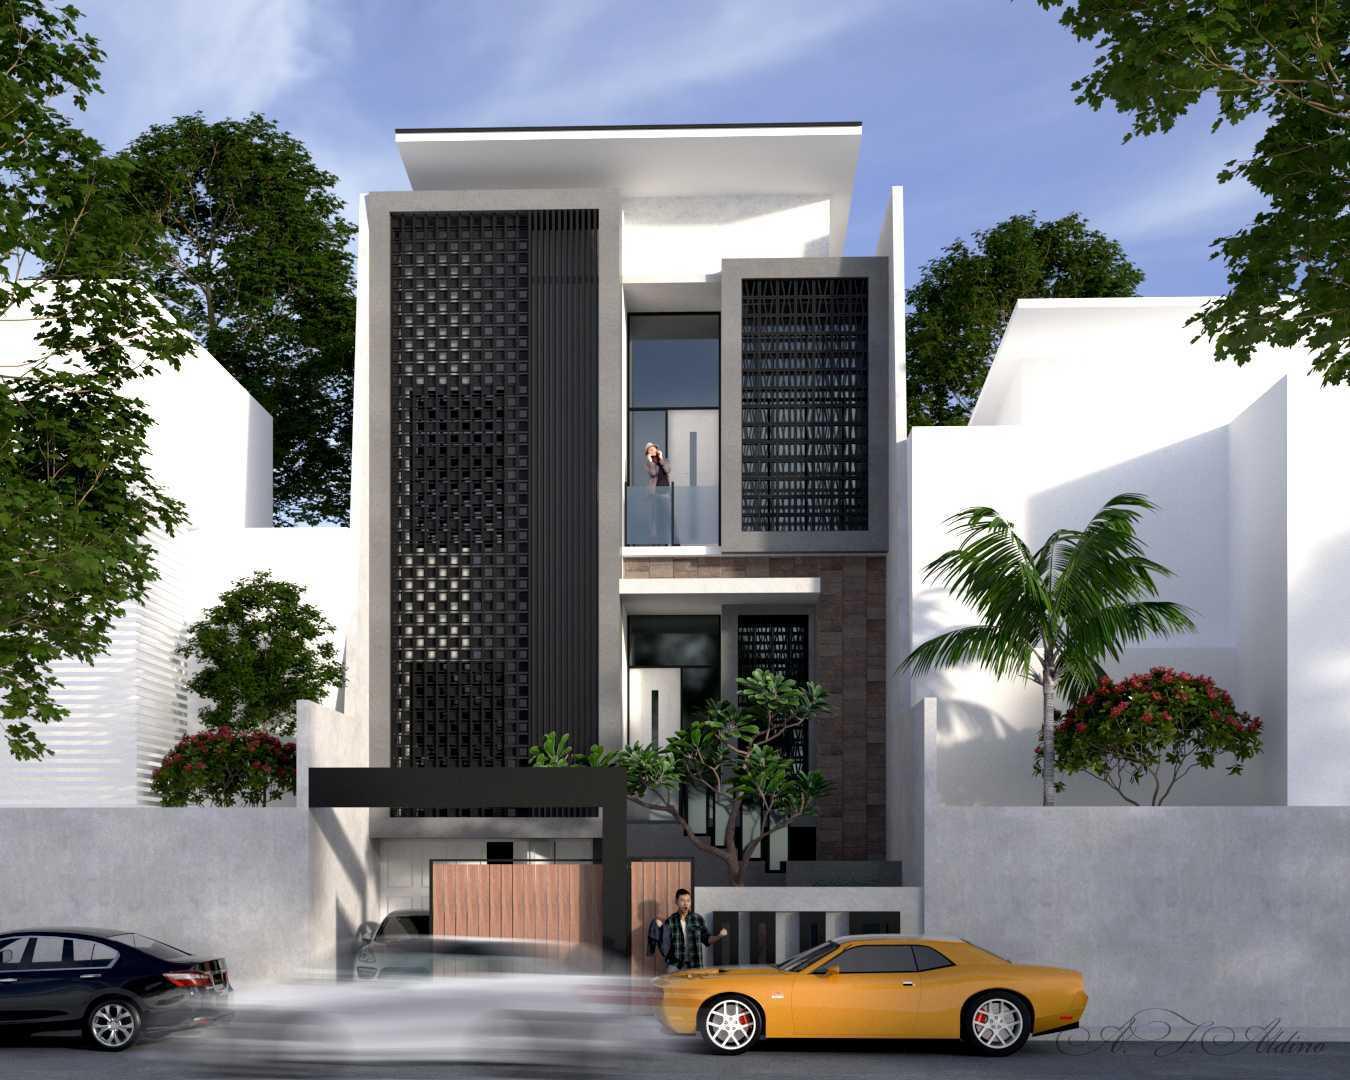 Andi Fauzy Aldino Box House Kota Makassar, Sulawesi Selatan, Indonesia Kota Makassar, Sulawesi Selatan, Indonesia Front View Rendering Contemporary 46967